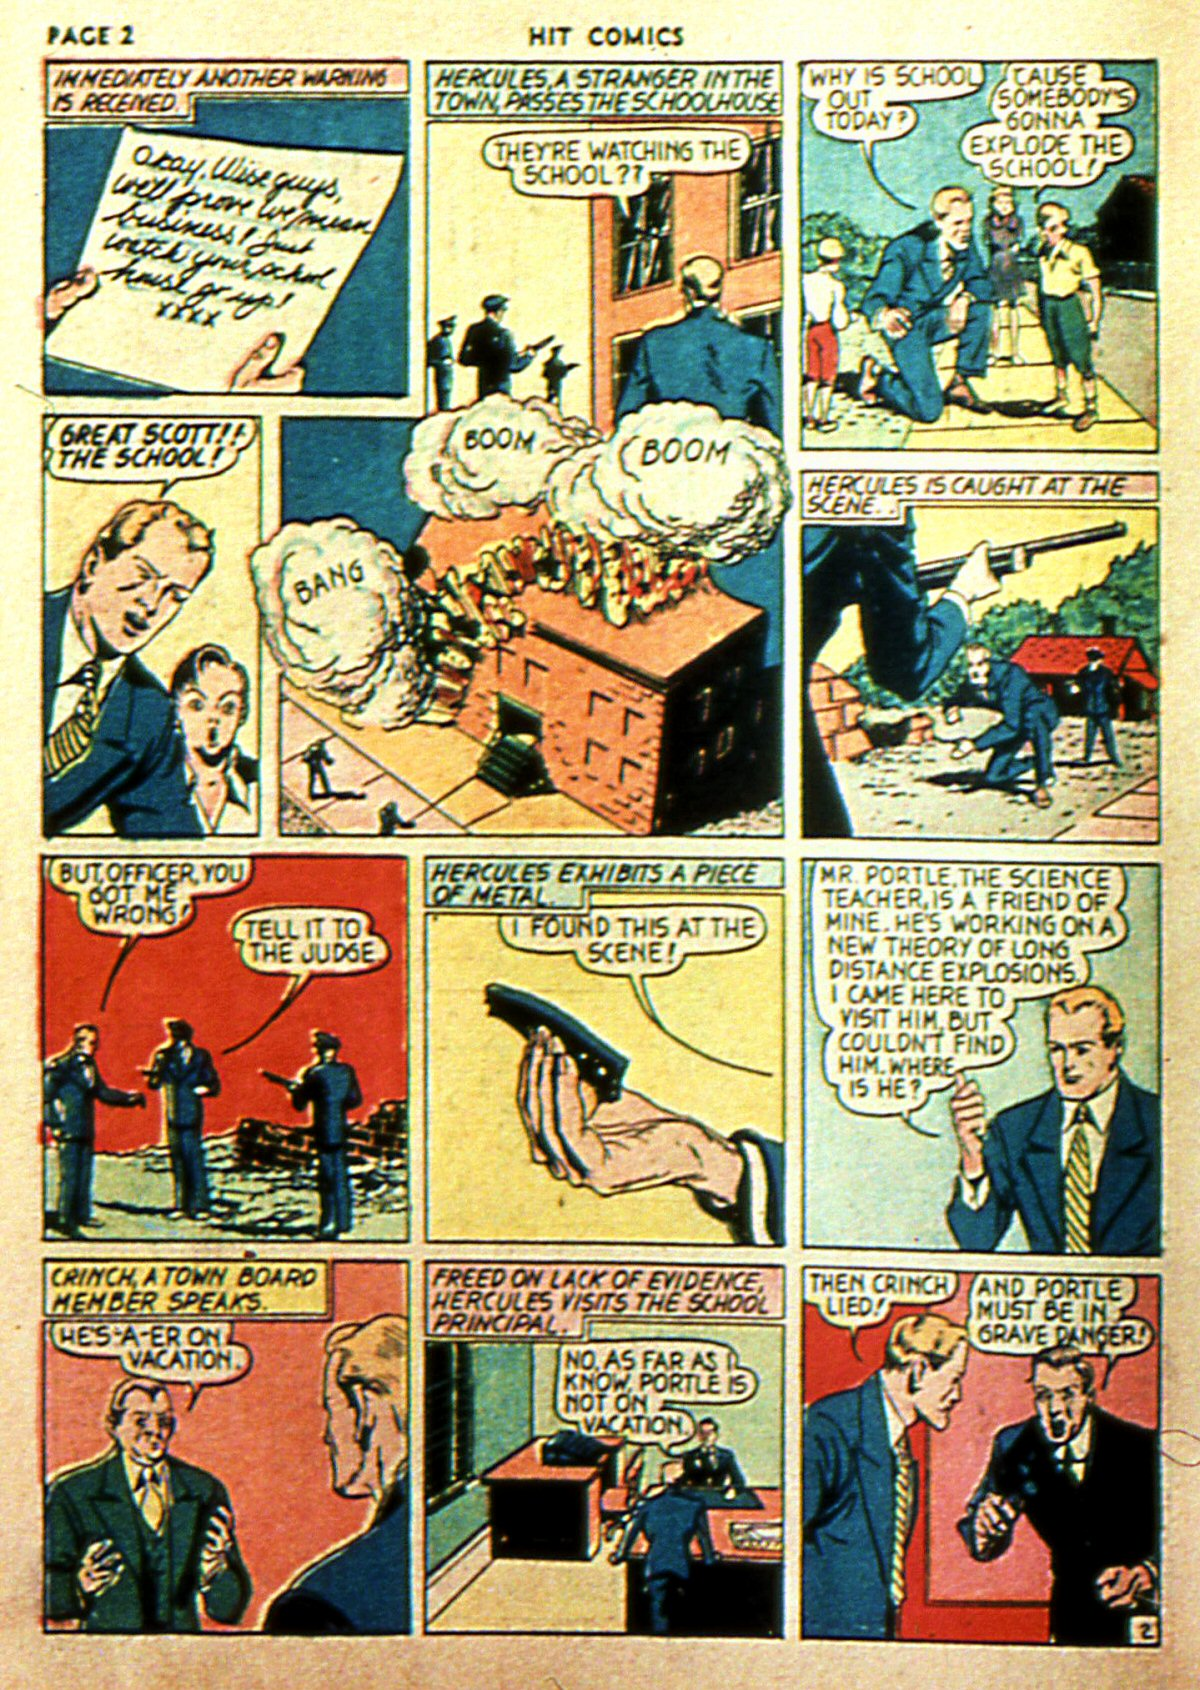 Read online Hit Comics comic -  Issue #2 - 4